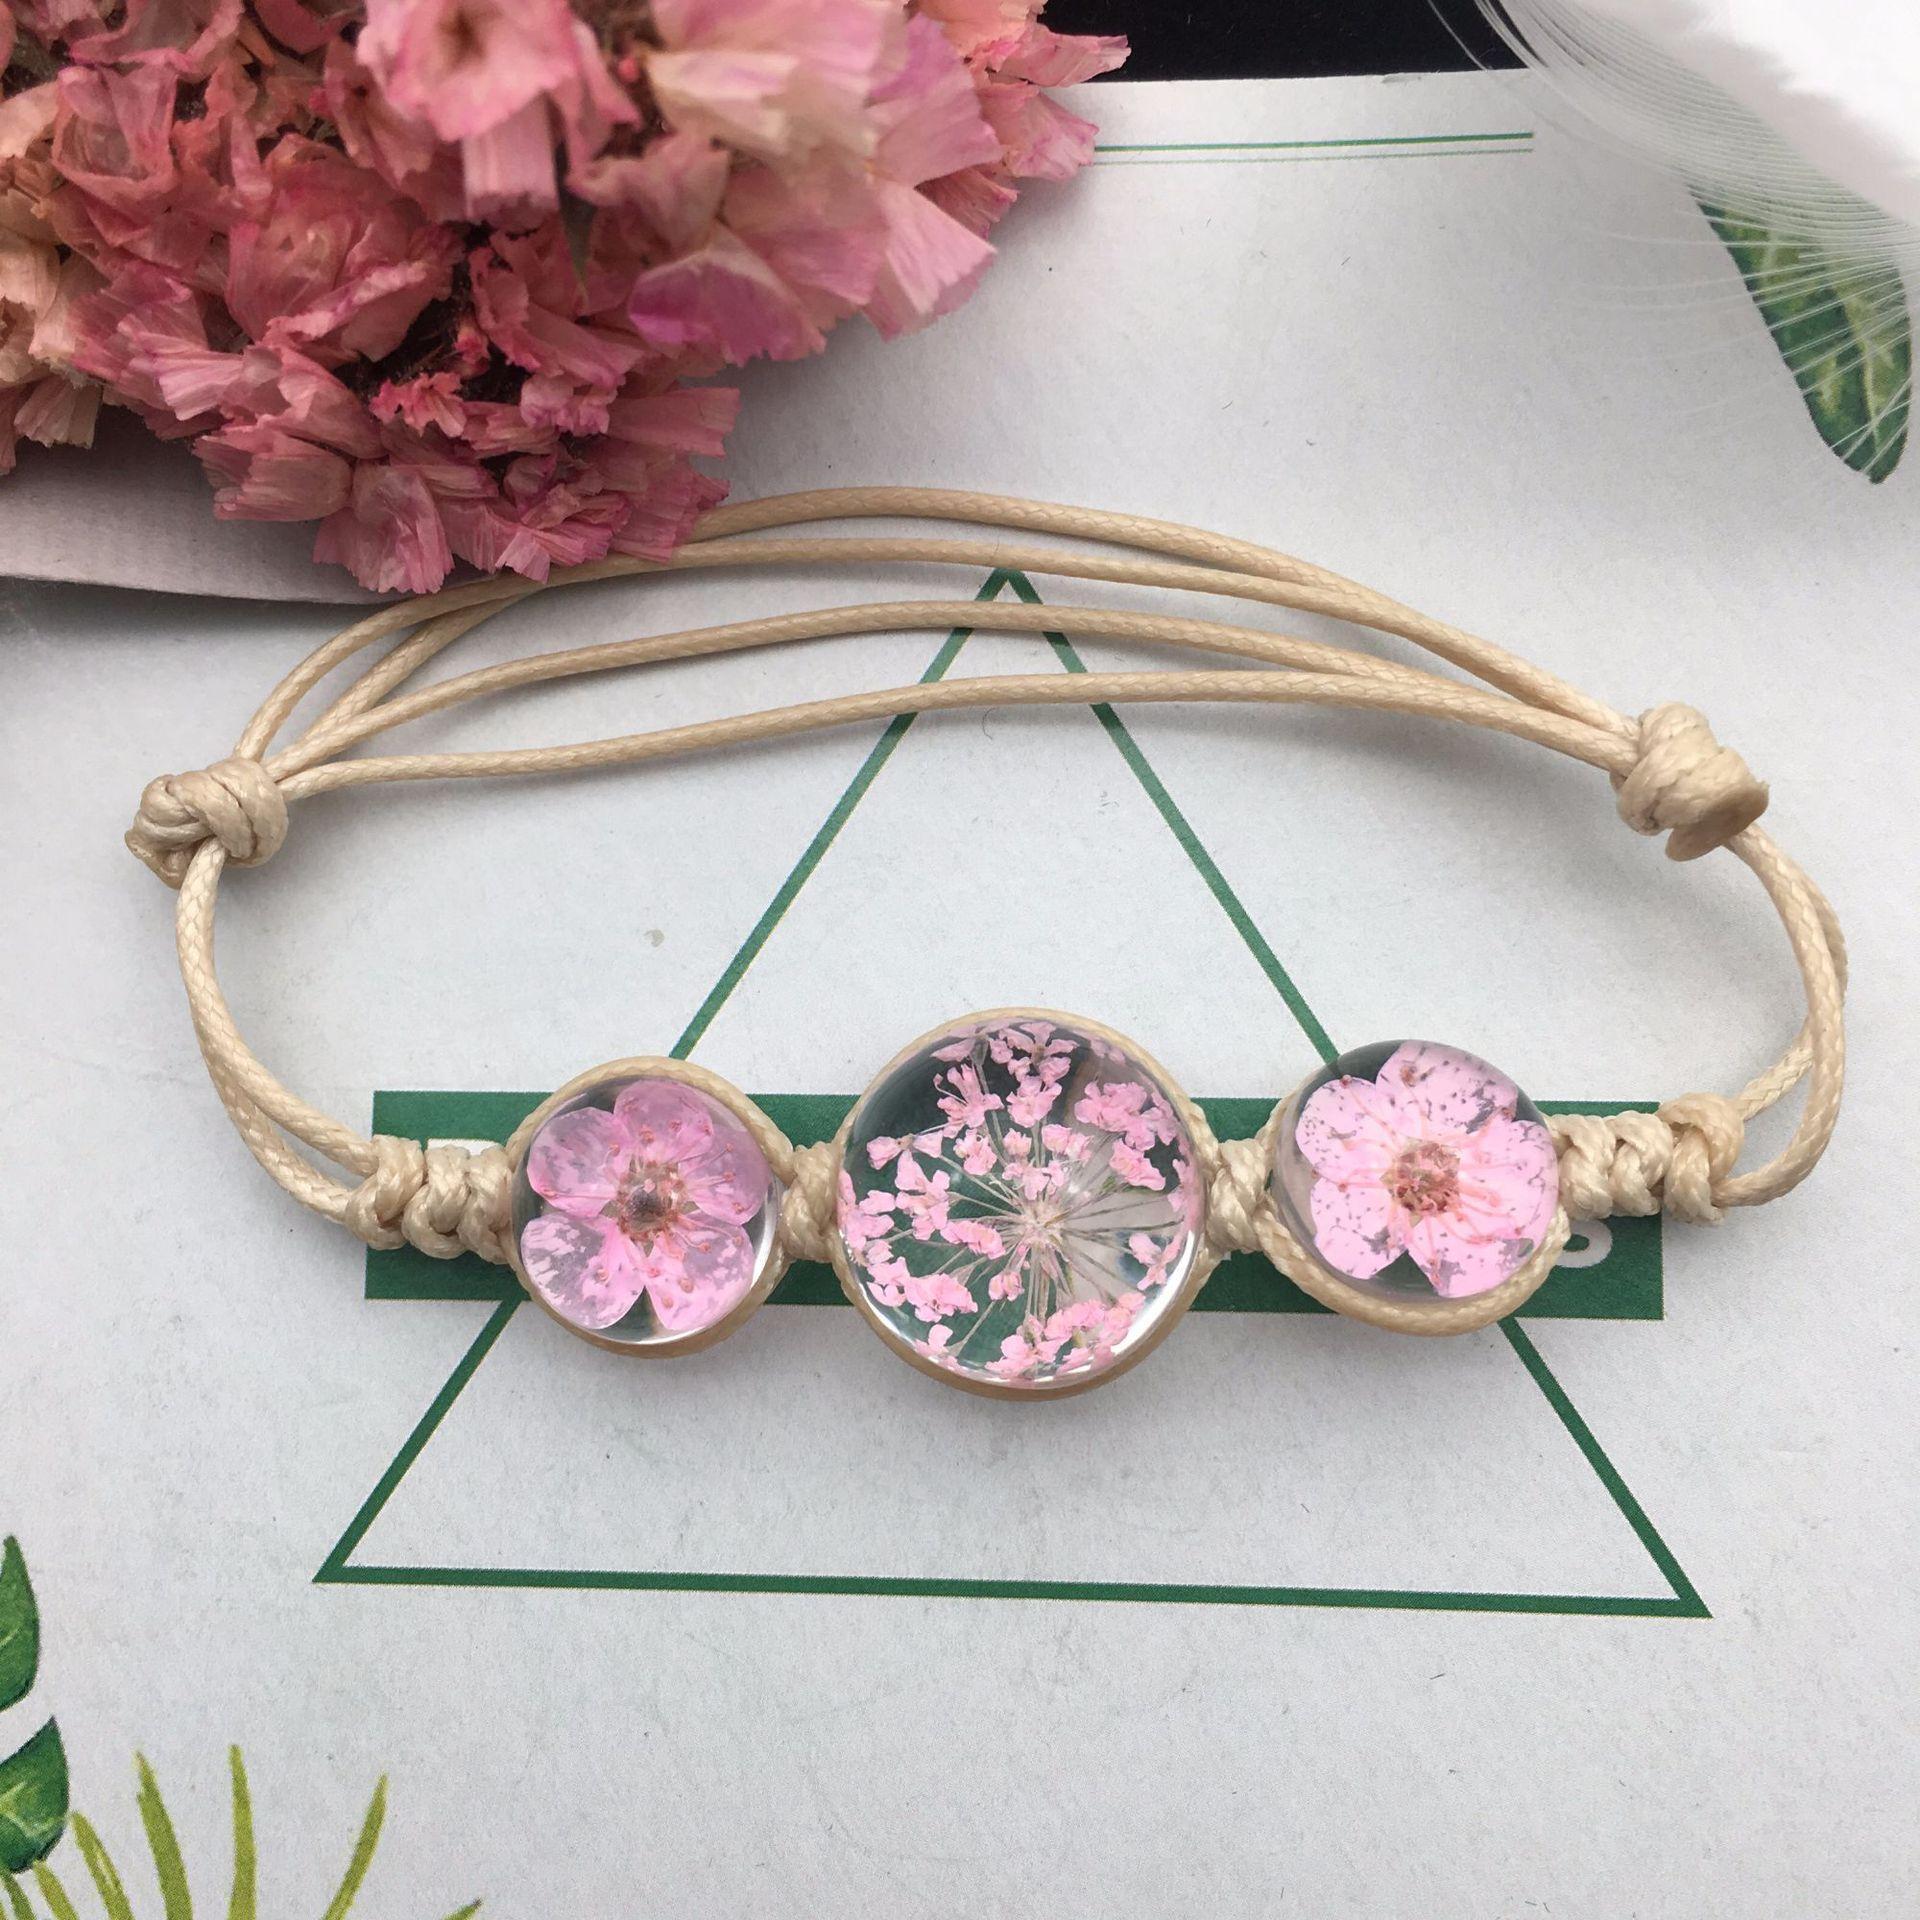 Summer Style Glass Ball Woven Bracelet Weave Lucky Flower Bracelets Handmade Dried Flowers Glass Beads Bracelet Women Jewelry Holiday Gift